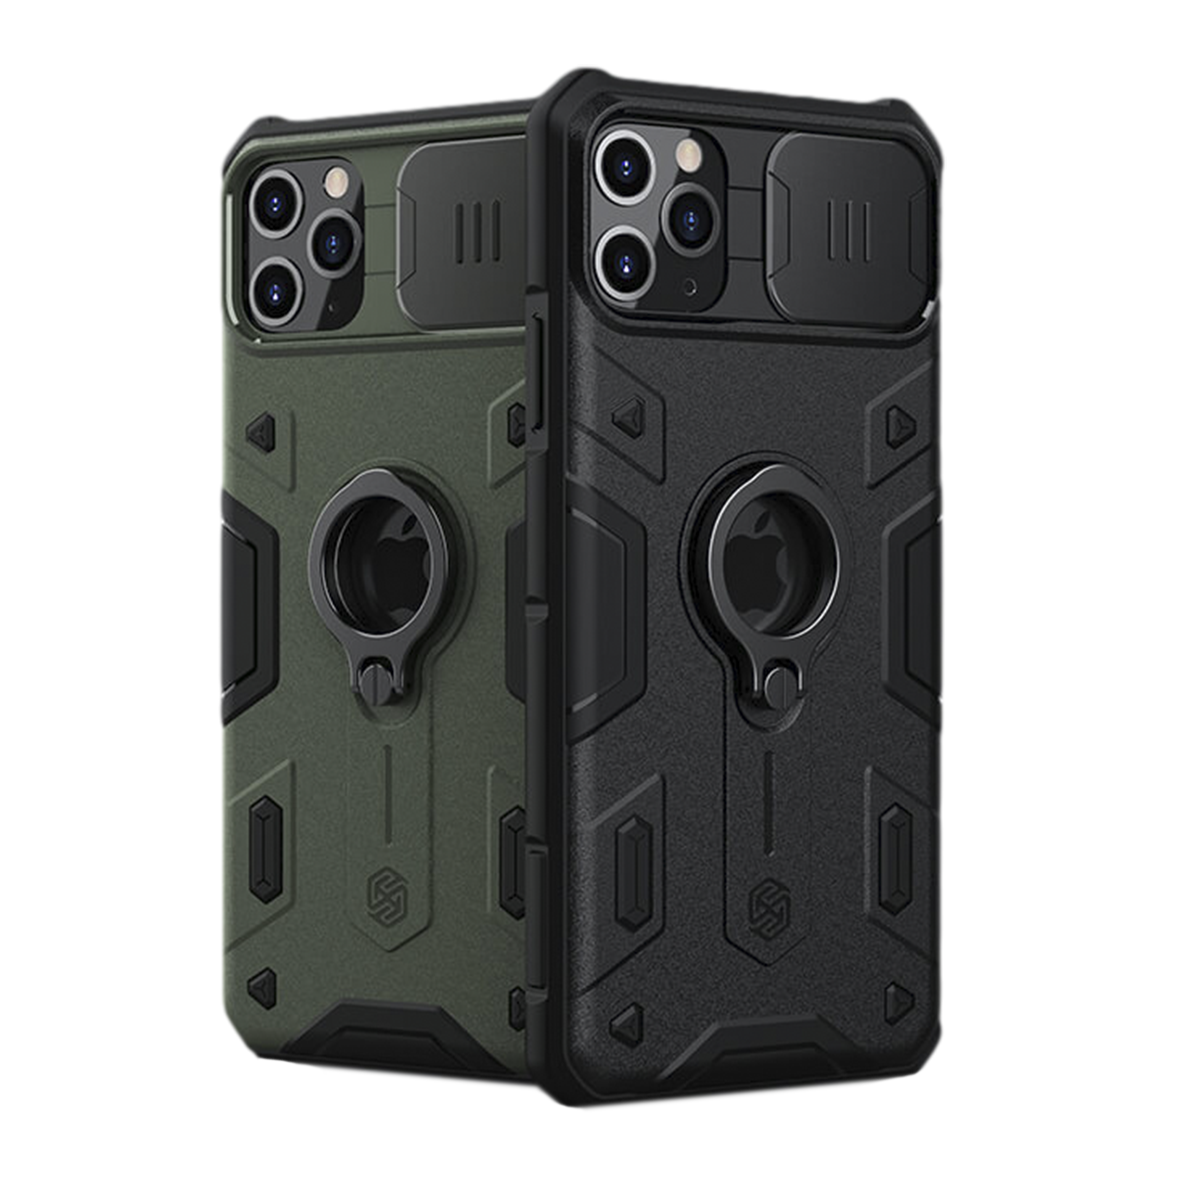 Nillkin CamShield Armor Case